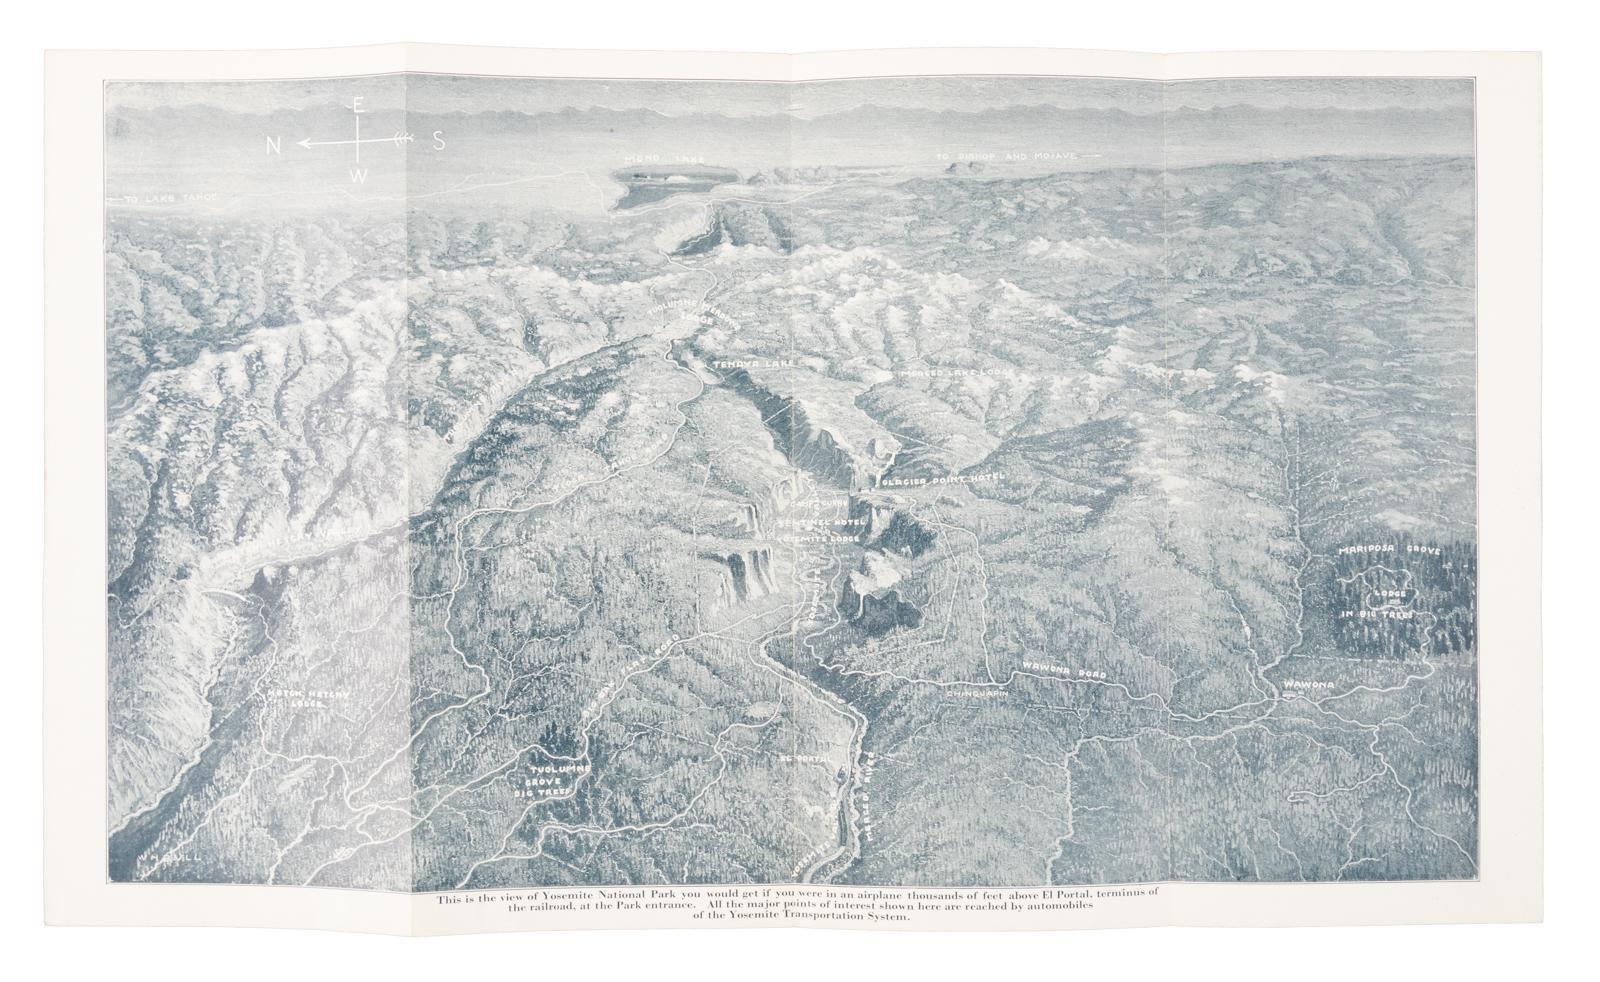 Yosemite Map Of West on bass lake map, fresno map, yellowstone west map, atlanta west map, stockton map, clovis west map, ontario west map, minto west map, grand canyon west map, greyhound west map, rocky mountain west map, washington west map, huntington lake map, united states west map, windsor west map, vieux montreal map,